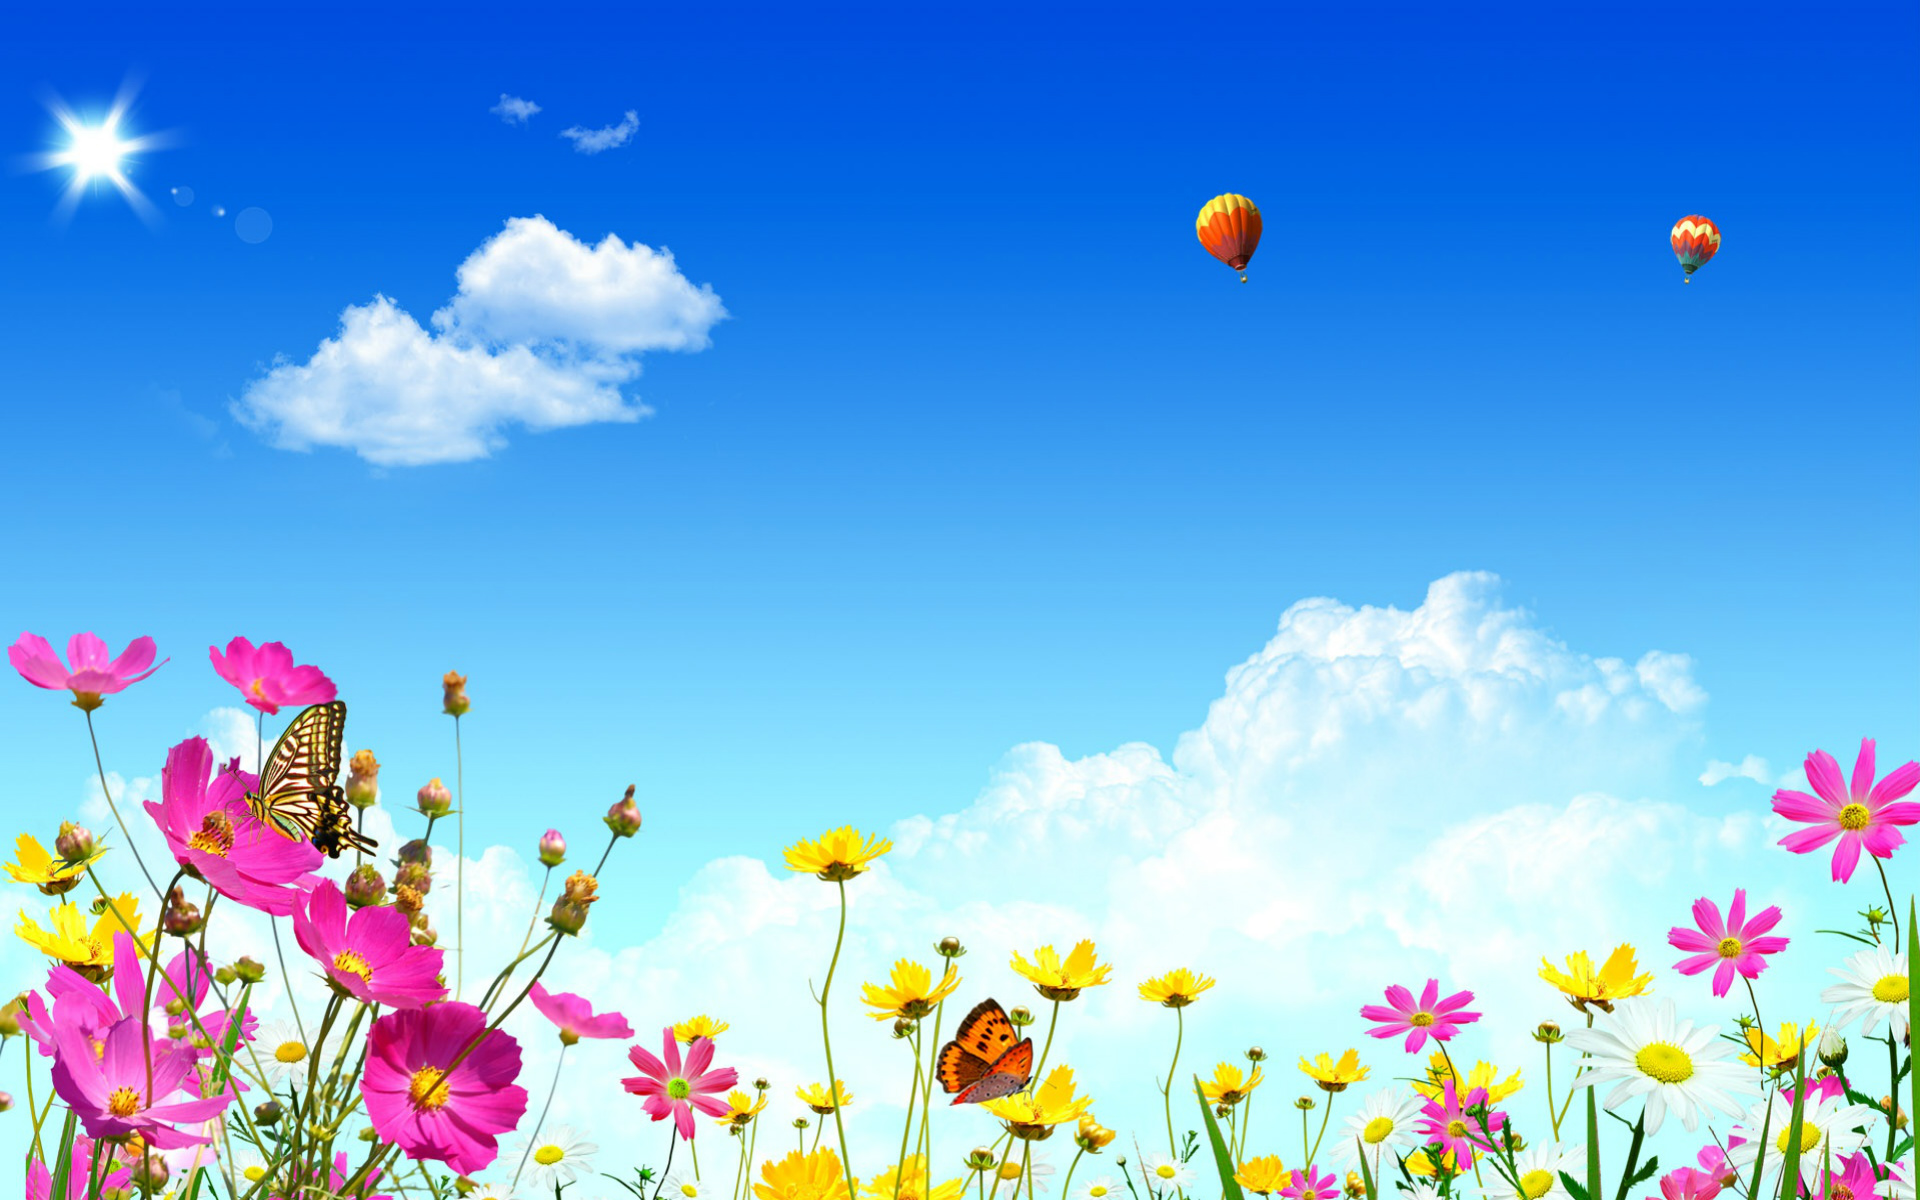 Spring free desktop wallpaper background wallpapersafari - Free computer backgrounds for spring ...